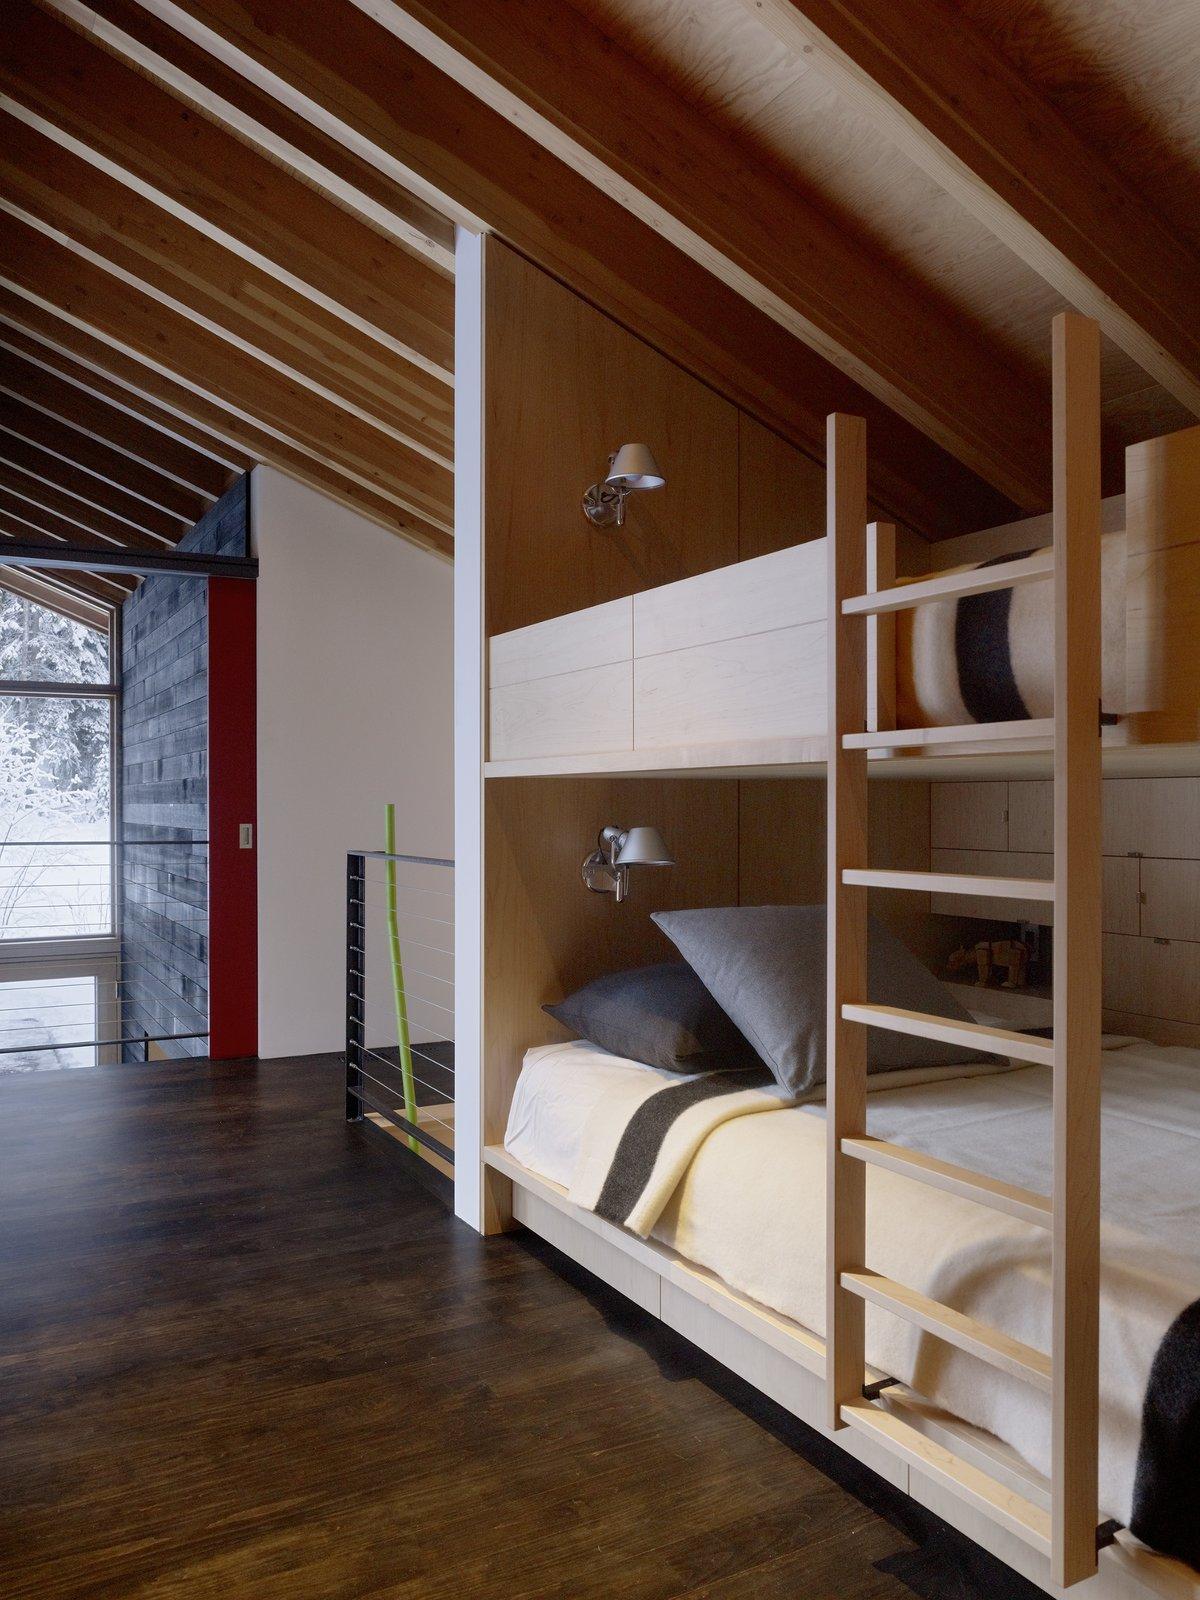 Bedroom, Bunks, Wall Lighting, and Dark Hardwood Floor  Kicking Horse Residence by Bohlin Cywinski Jackson